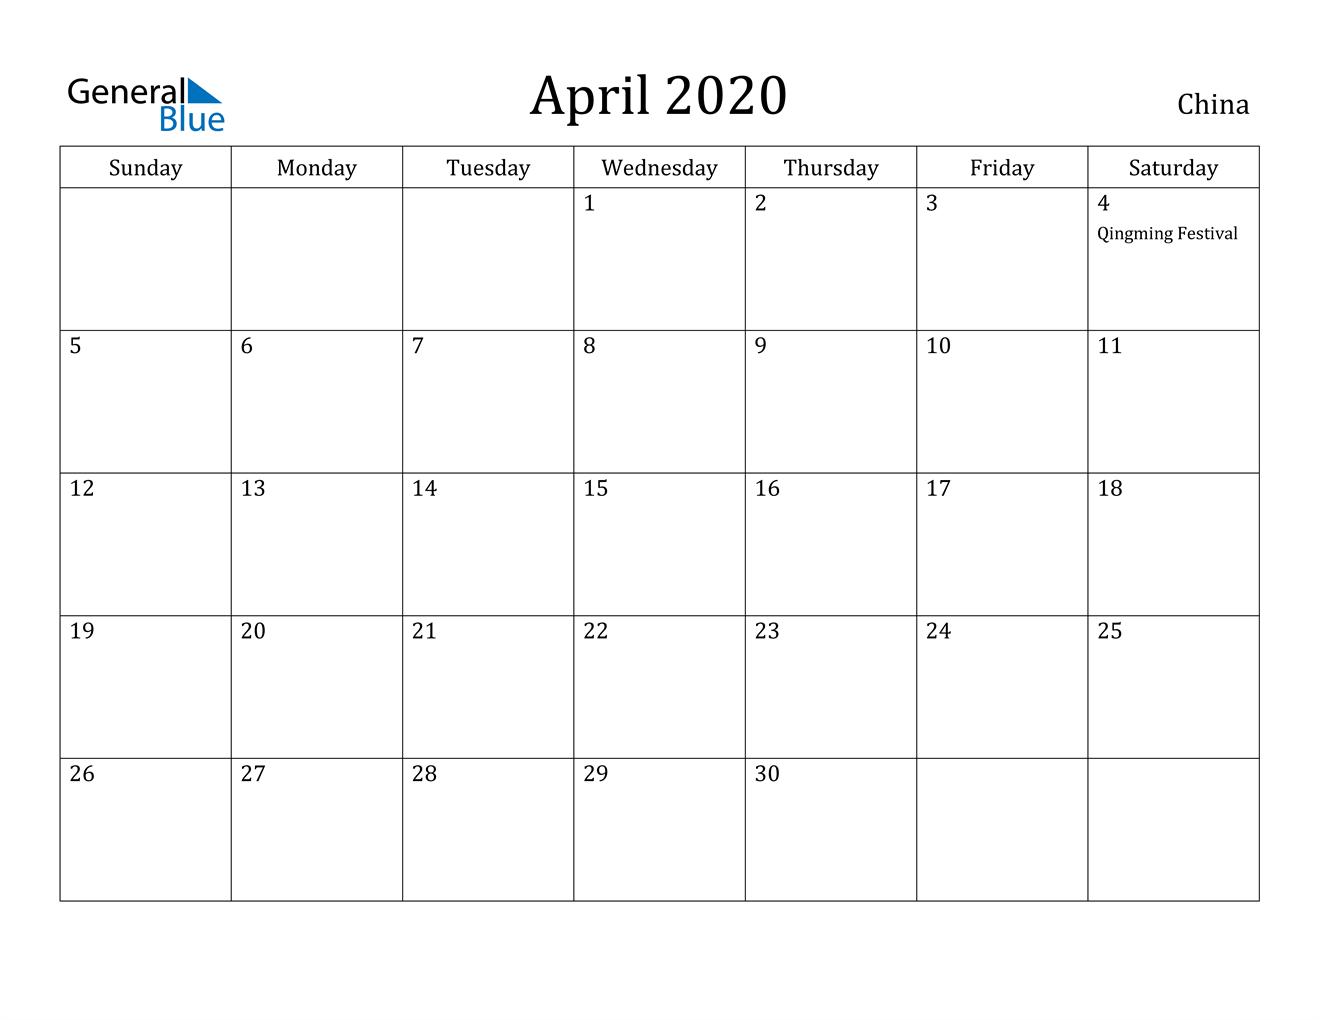 Image of April 2020 China Calendar with Holidays Calendar